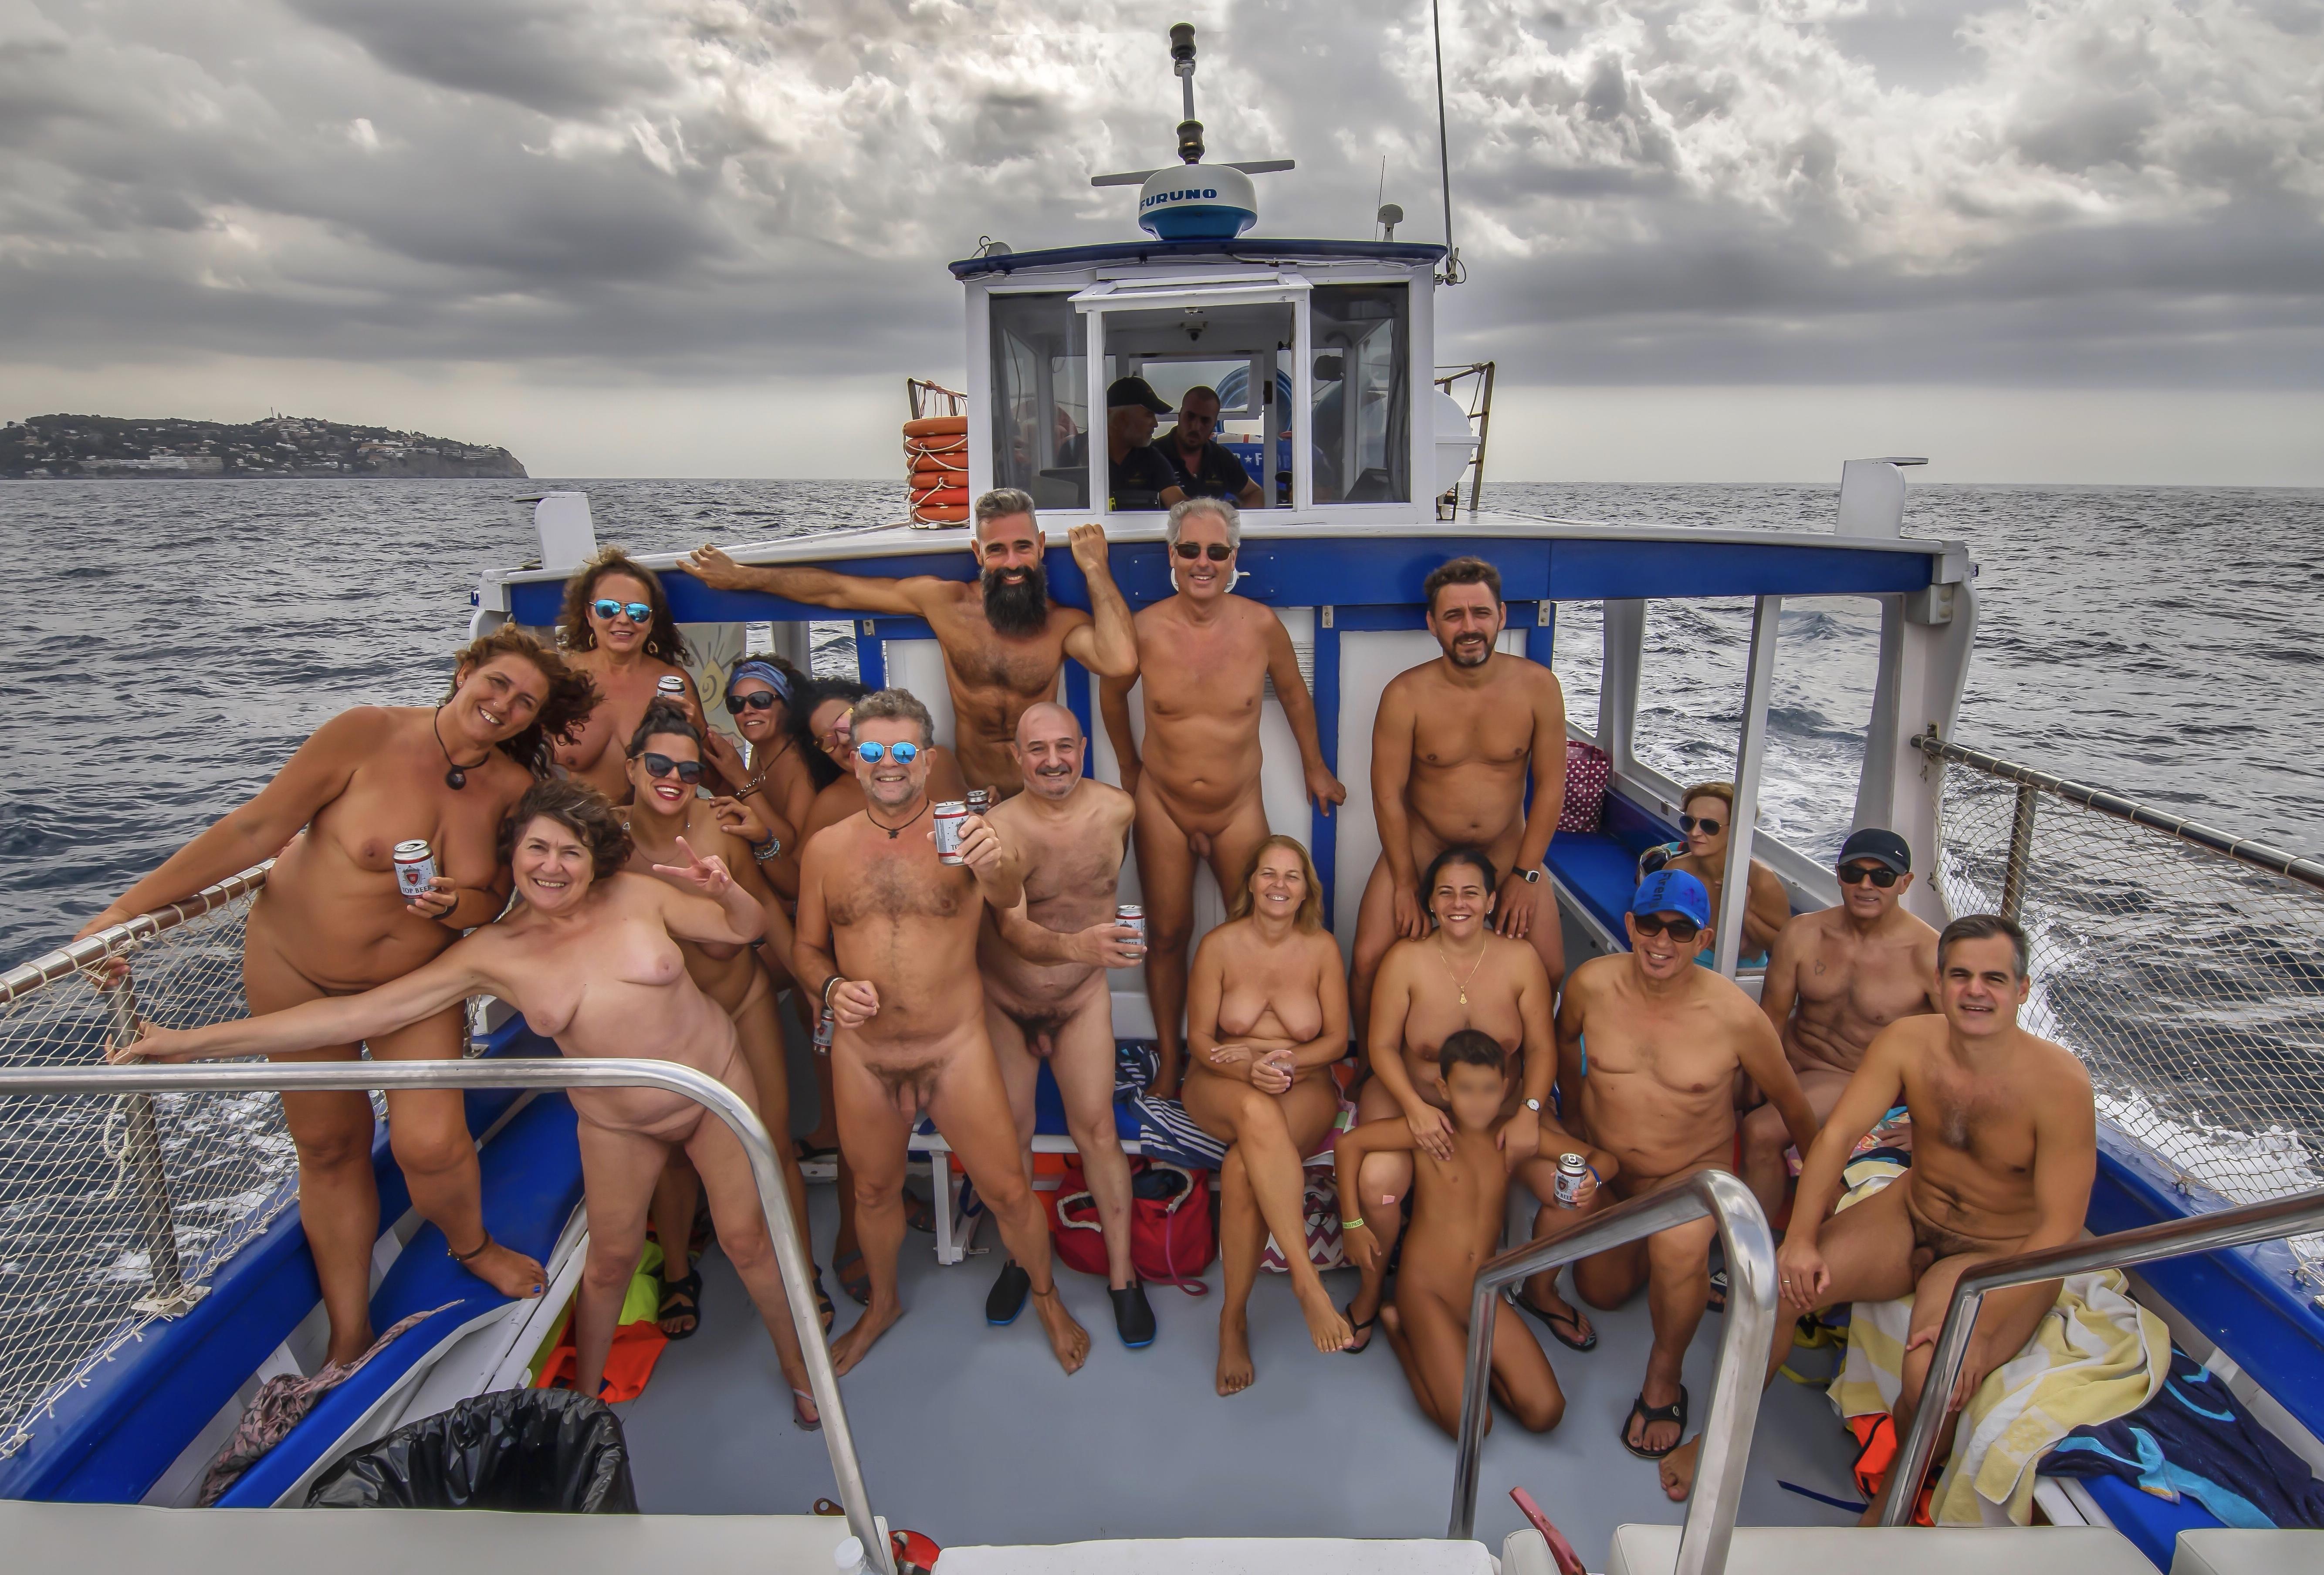 Paseo nudista en barco